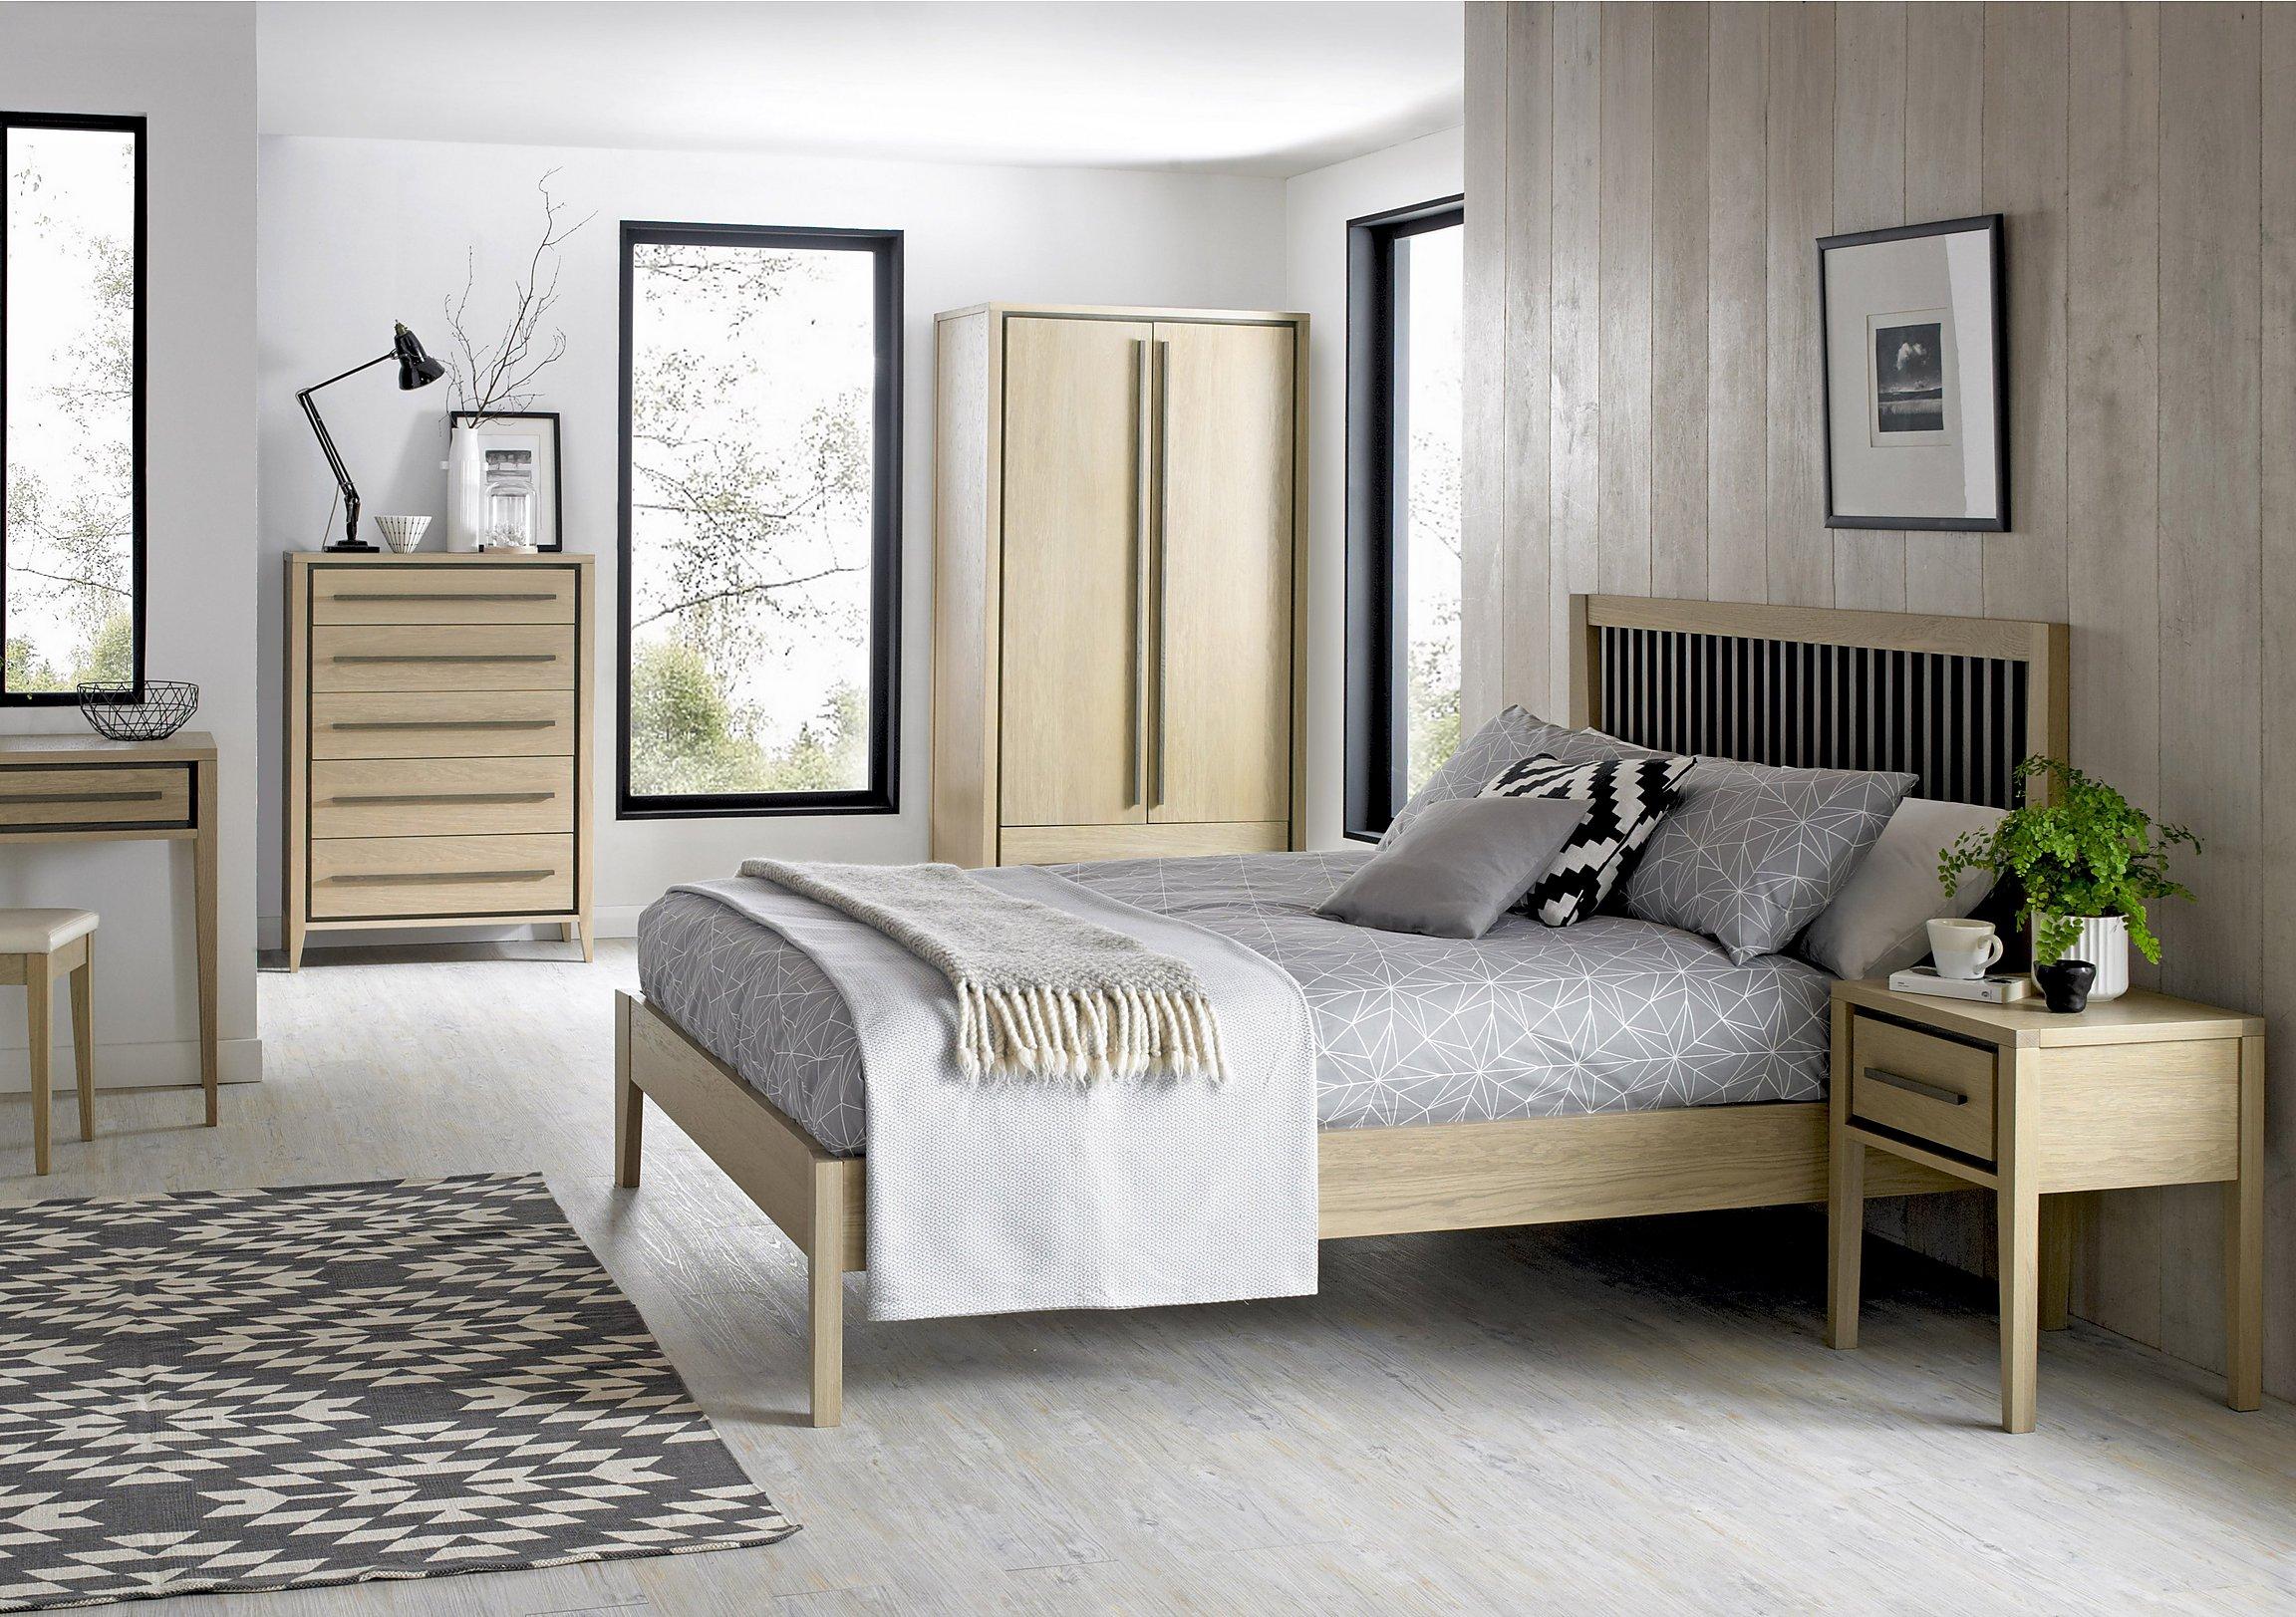 Lifestyle Bedroom Furniture Durrell 3 Piece Bedroom Set Furniture Village